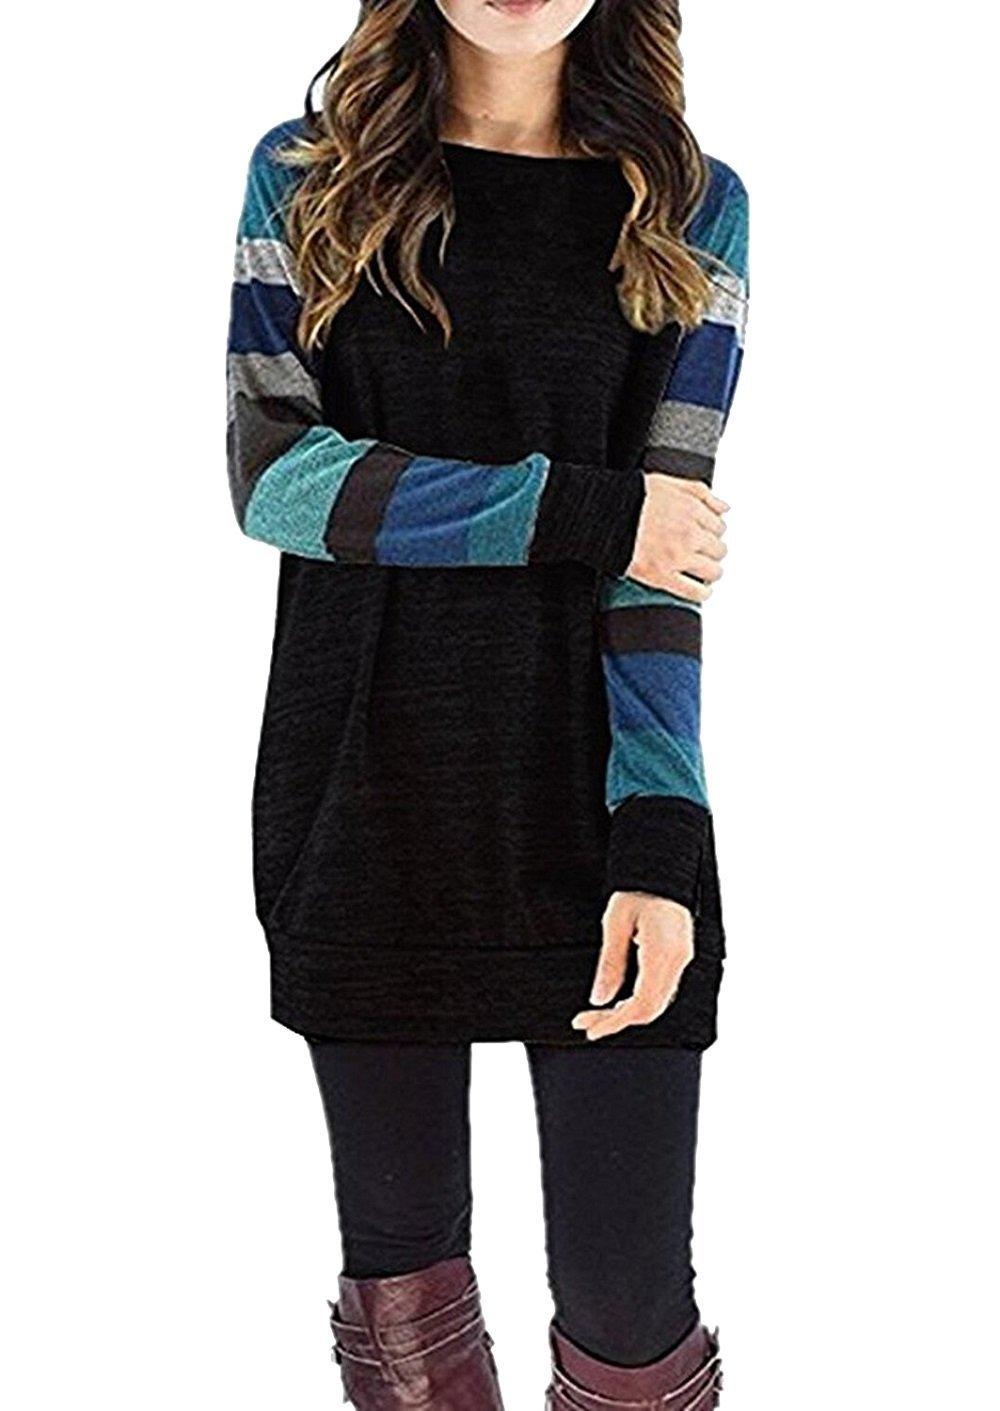 Hiistandd Women Sweatshirt Striped Sleeve Pullover Casual Round Neck Blouse Shirt